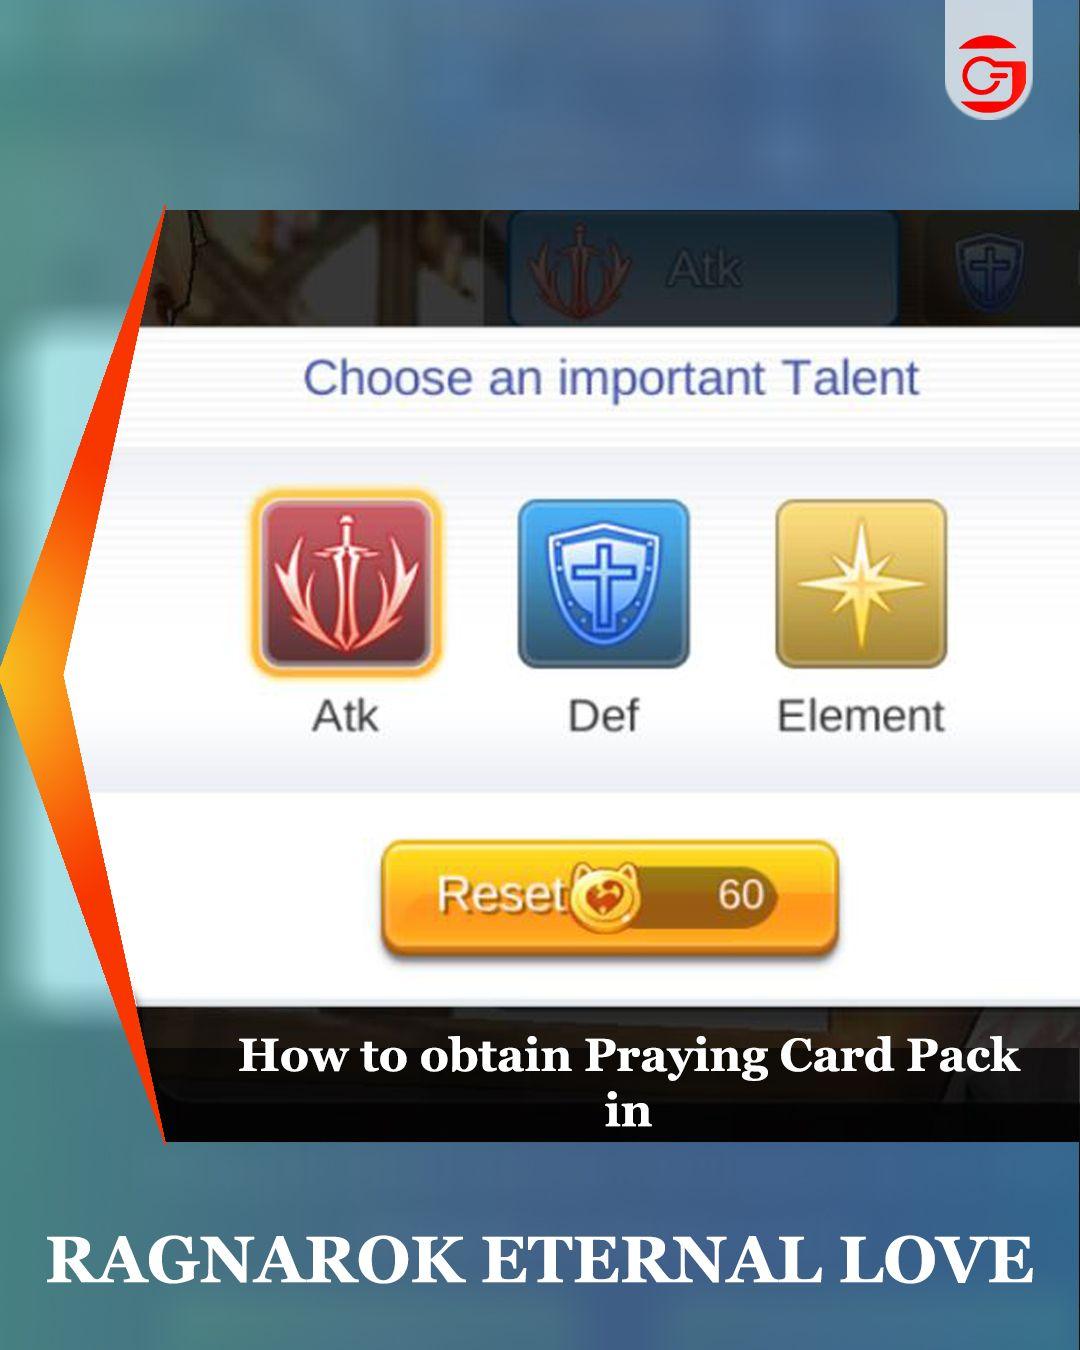 Praying Card Pack In Ragnarok Mobile Pack Of Cards Ragnarok Mobile What Is Pray